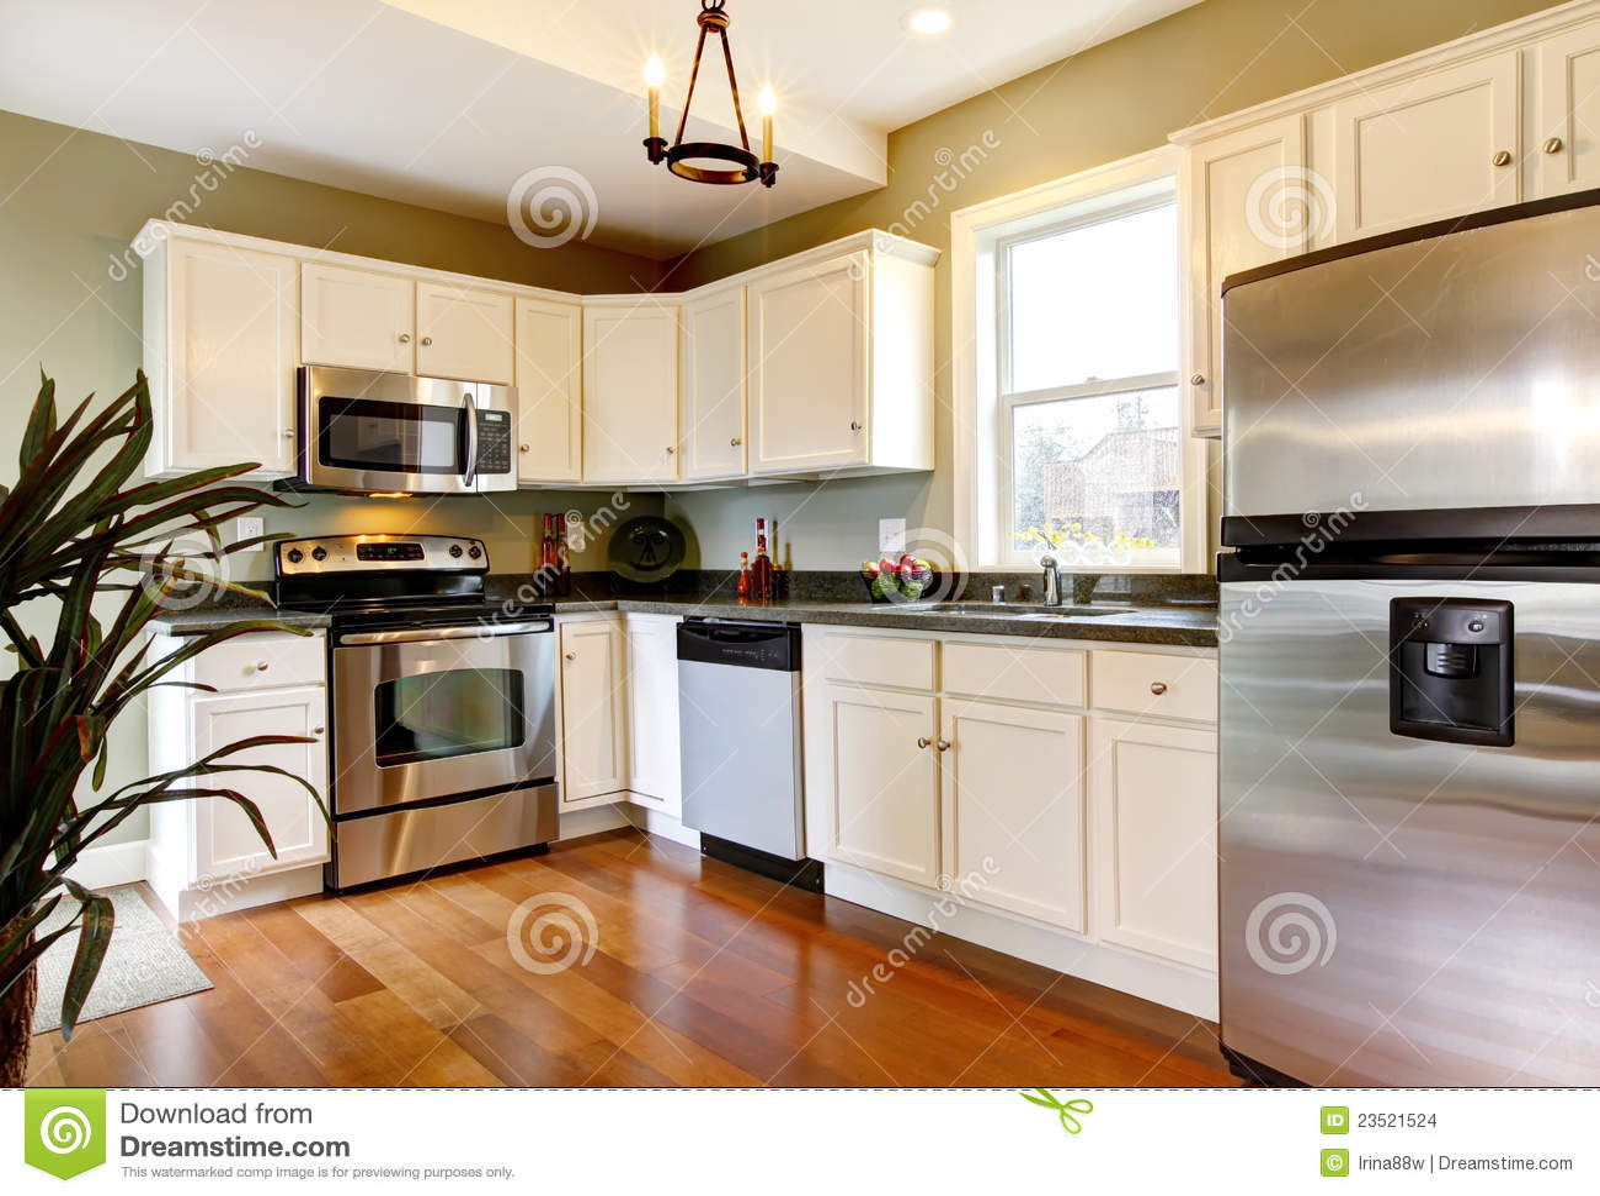 Cuisine neuve blanche et verte classique images stock - Cuisine blanche classique ...